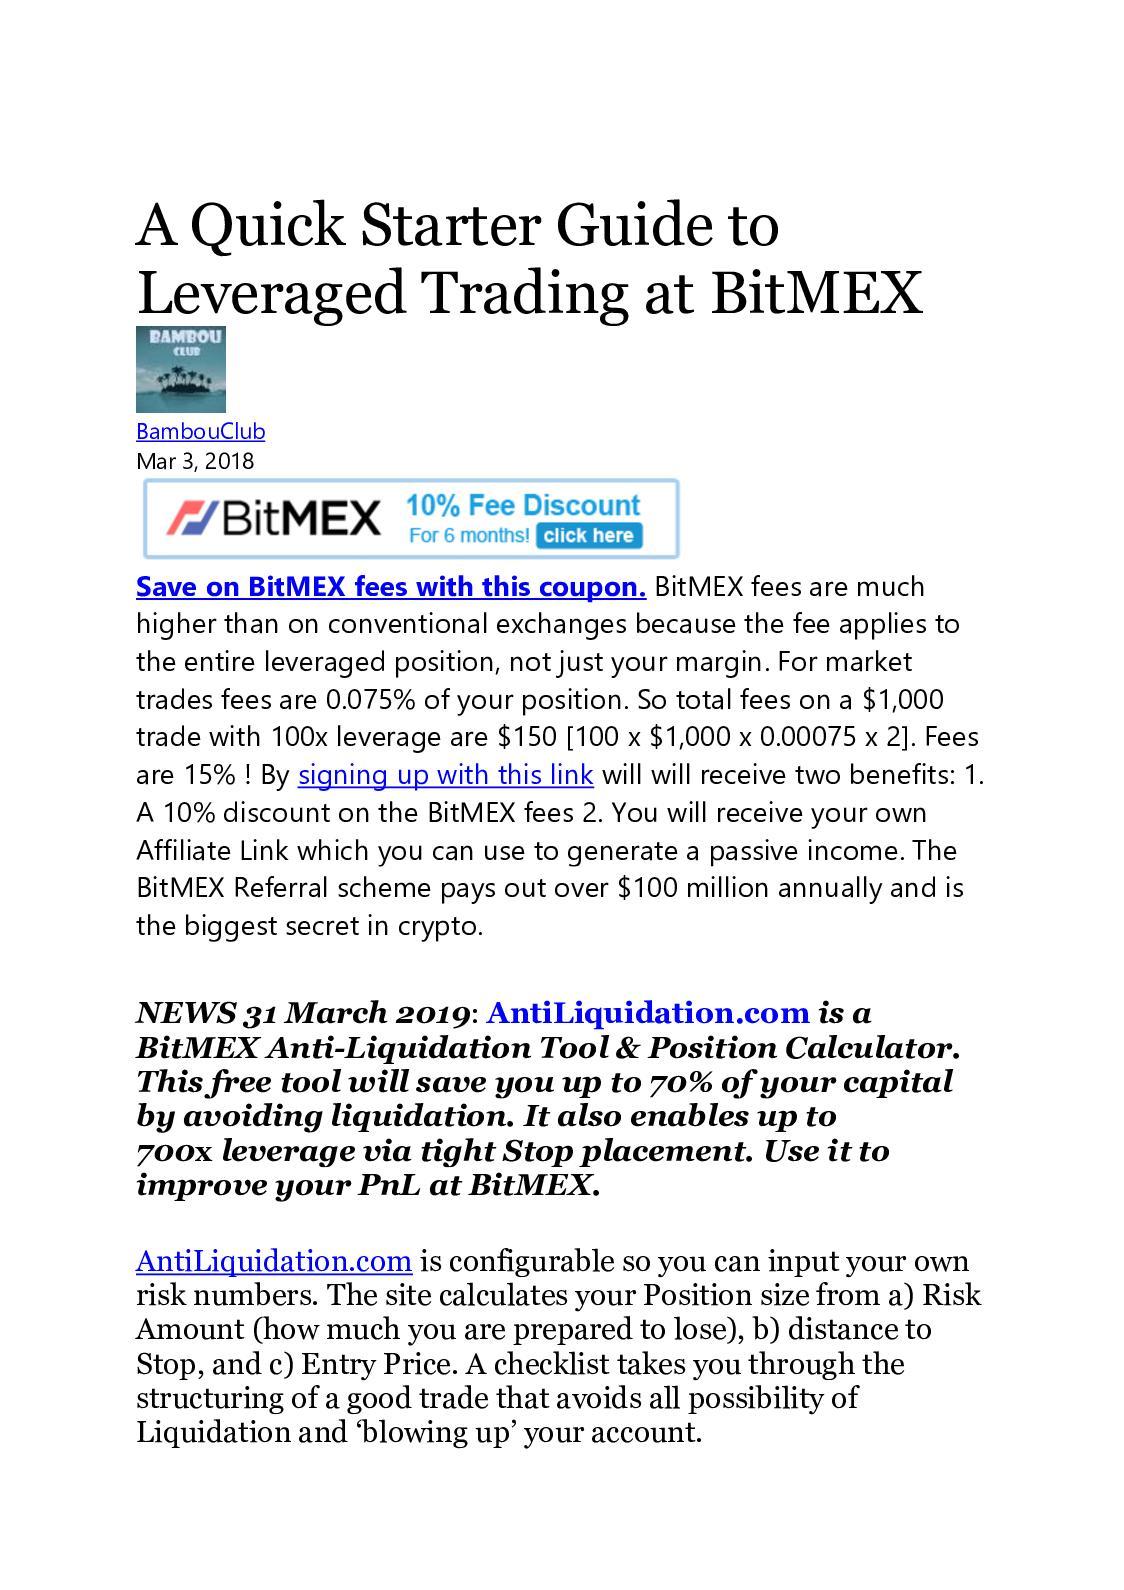 Calaméo - Bitmex Leveraged Trading- Hackernoon